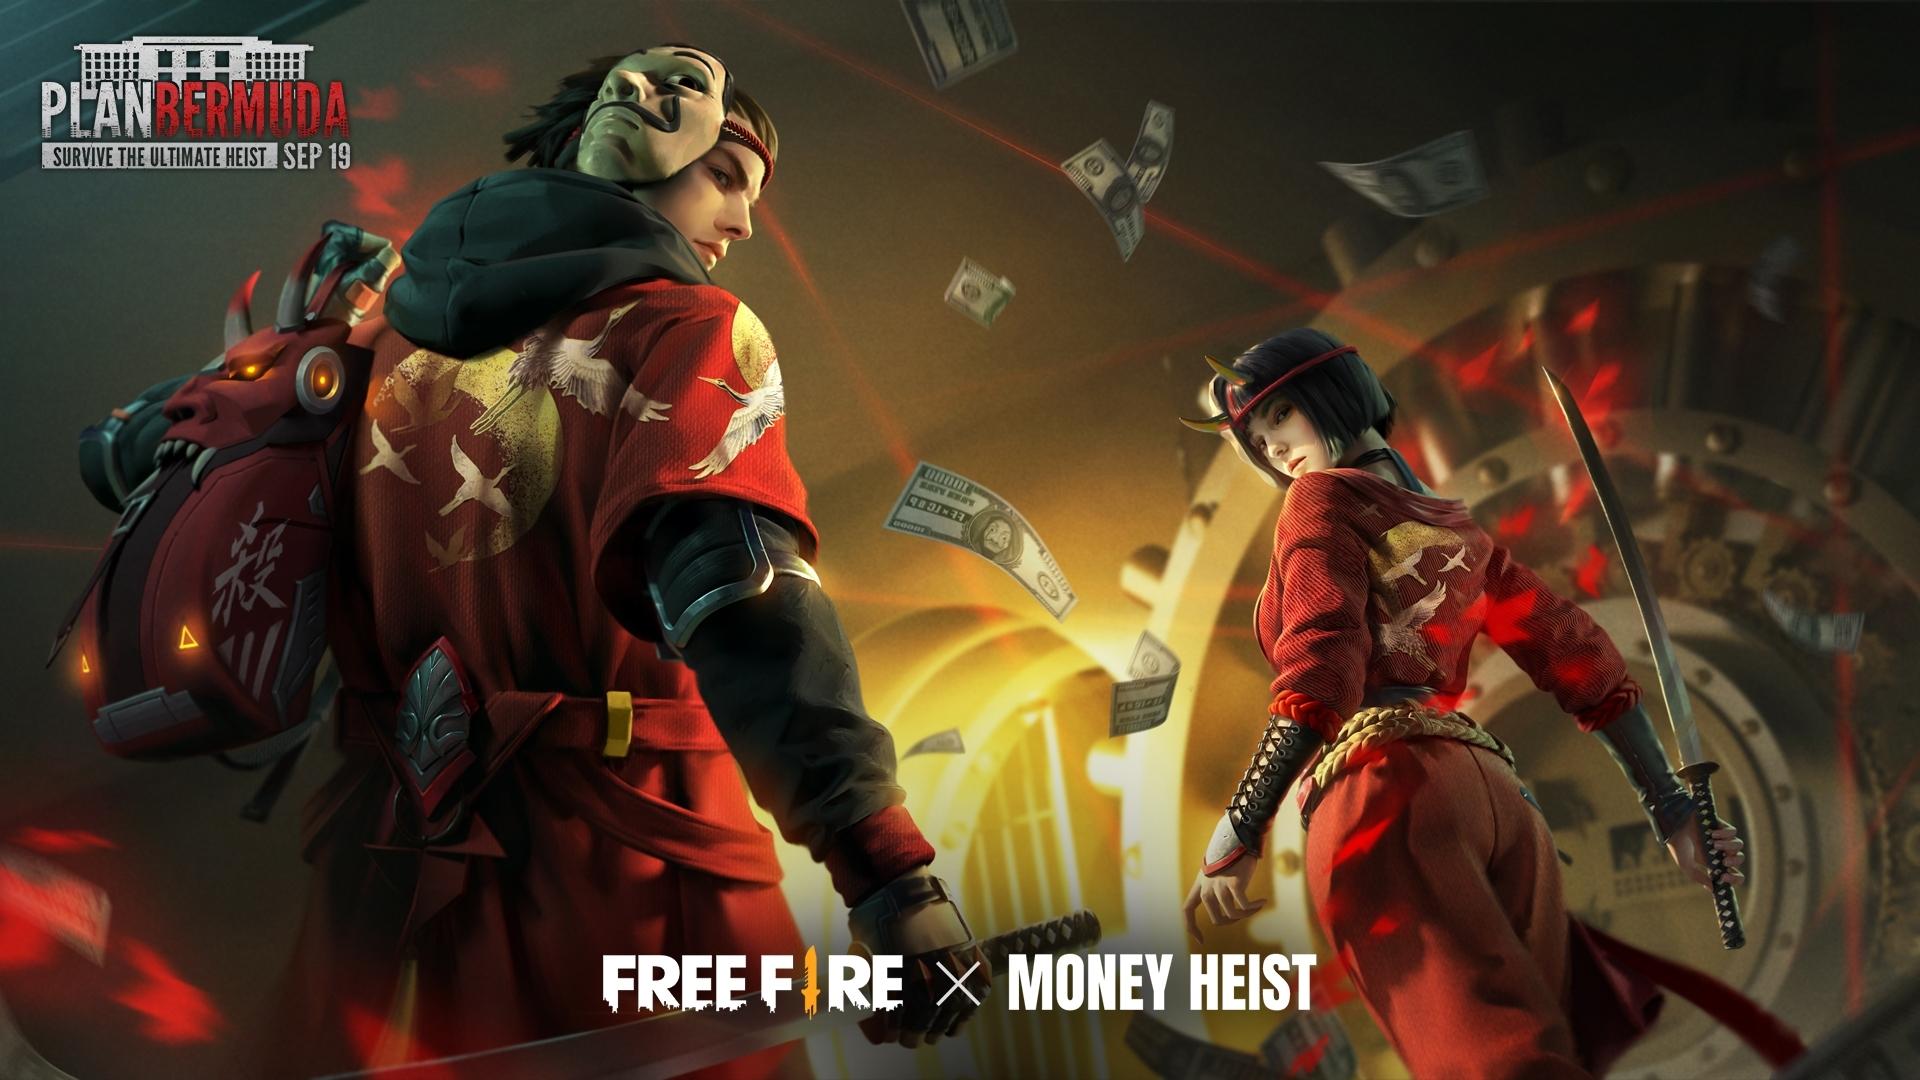 5 Fakta Free Fire x Money Heist, keseruan rencana besar The Professor